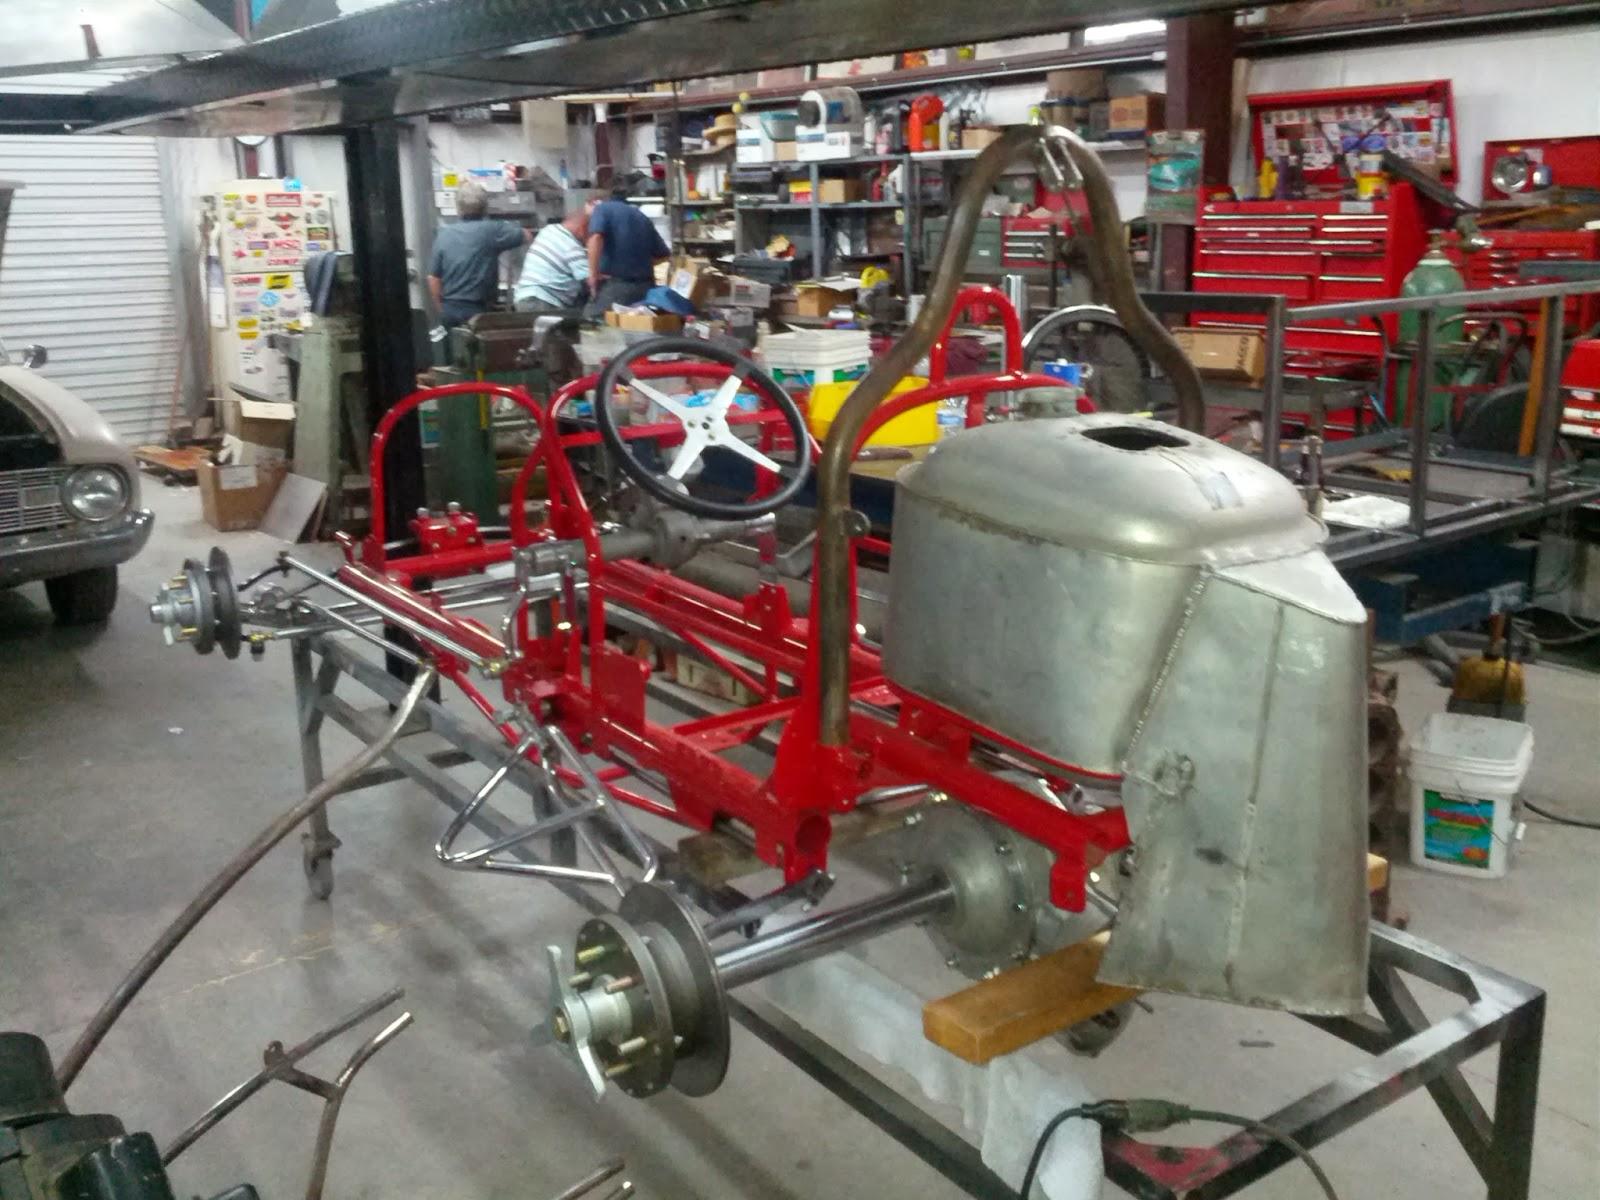 Midget auto racing history can not